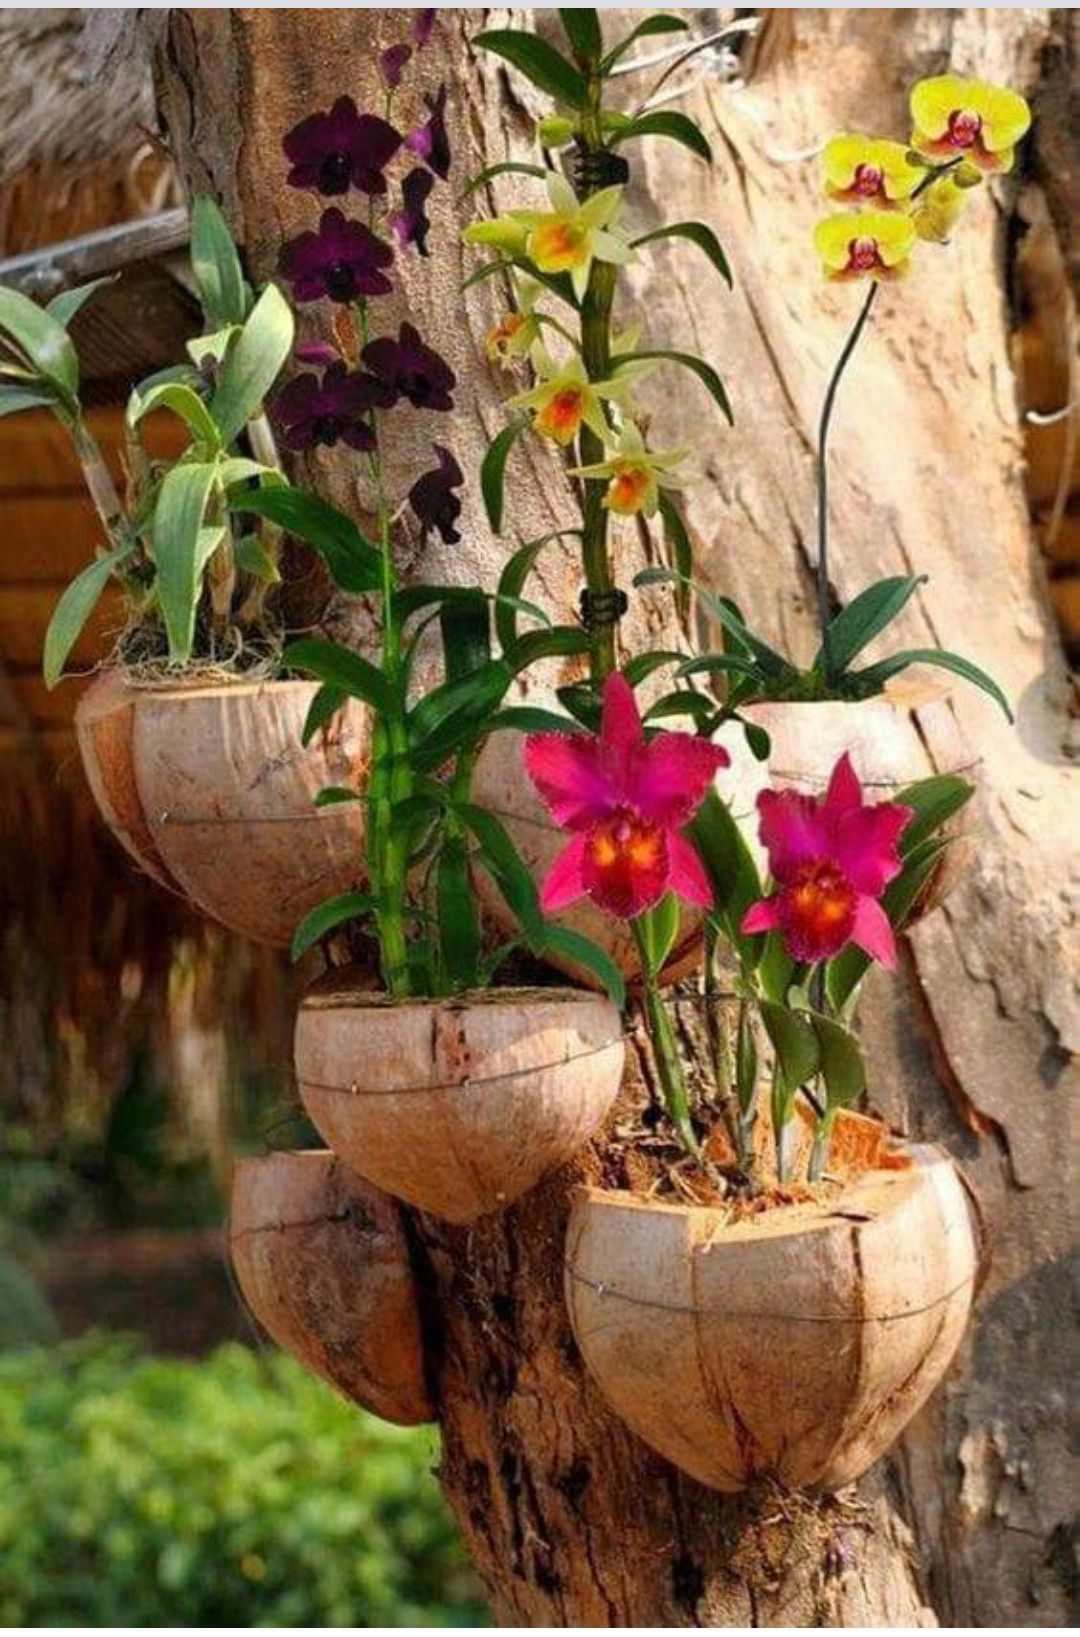 Pin By Maria Alejandra Tejada Sanabia On Jardines Terrazas Patios In 2020 Orchid Planters Hanging Orchid Plants